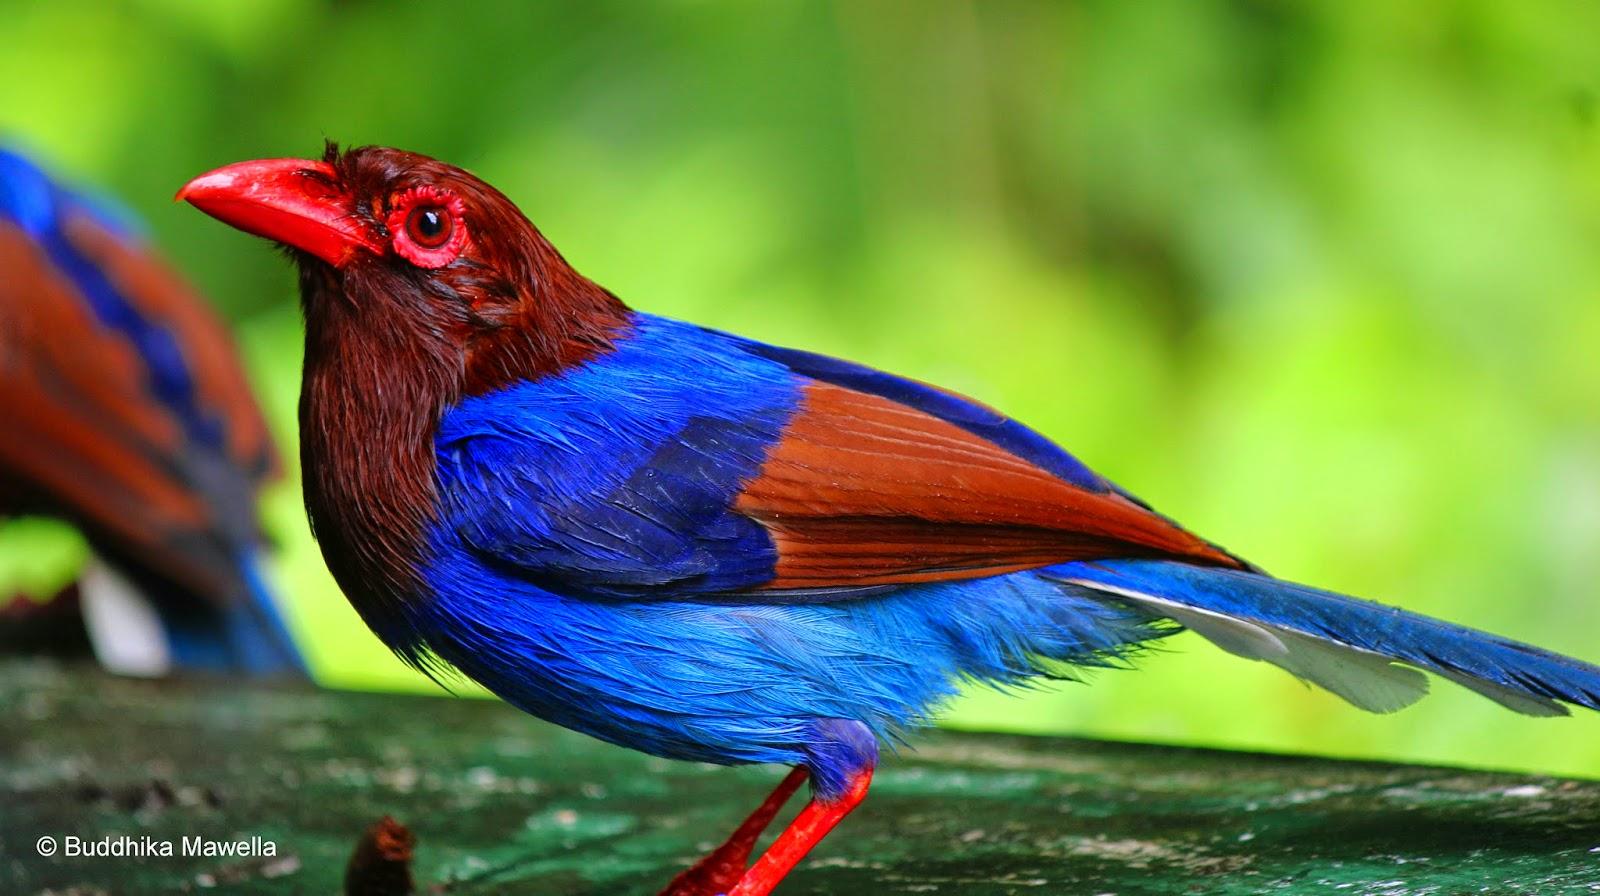 Sri Lanka Blue Magpie - Nature Travel Birding